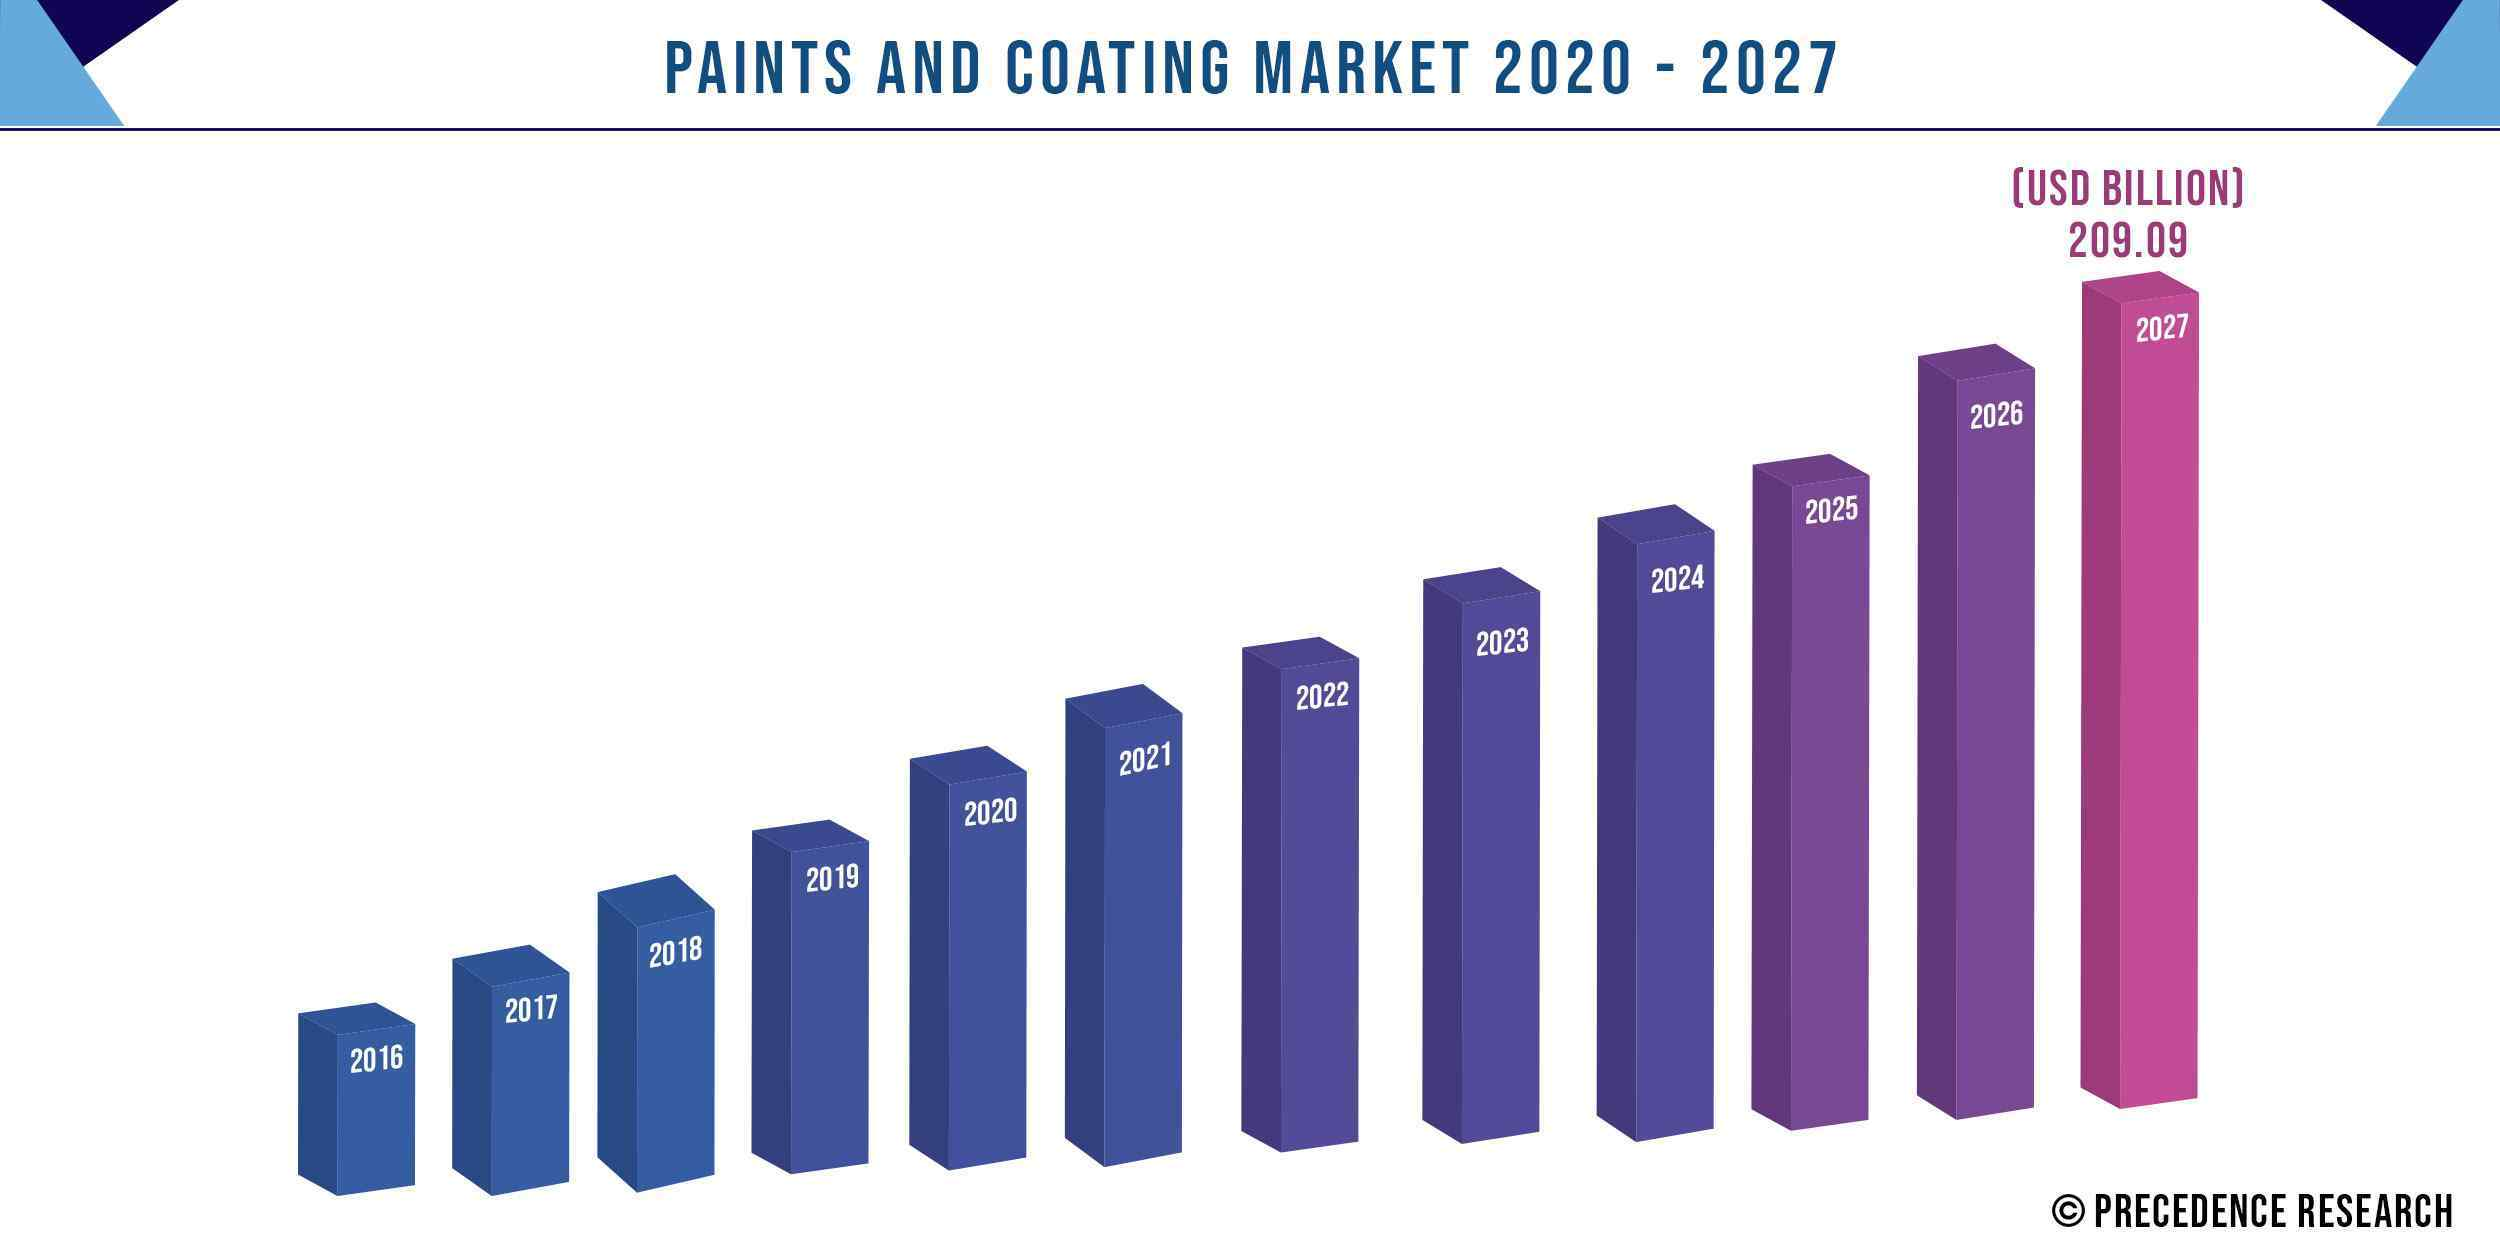 Paints and Coating Market Size 2016-2027